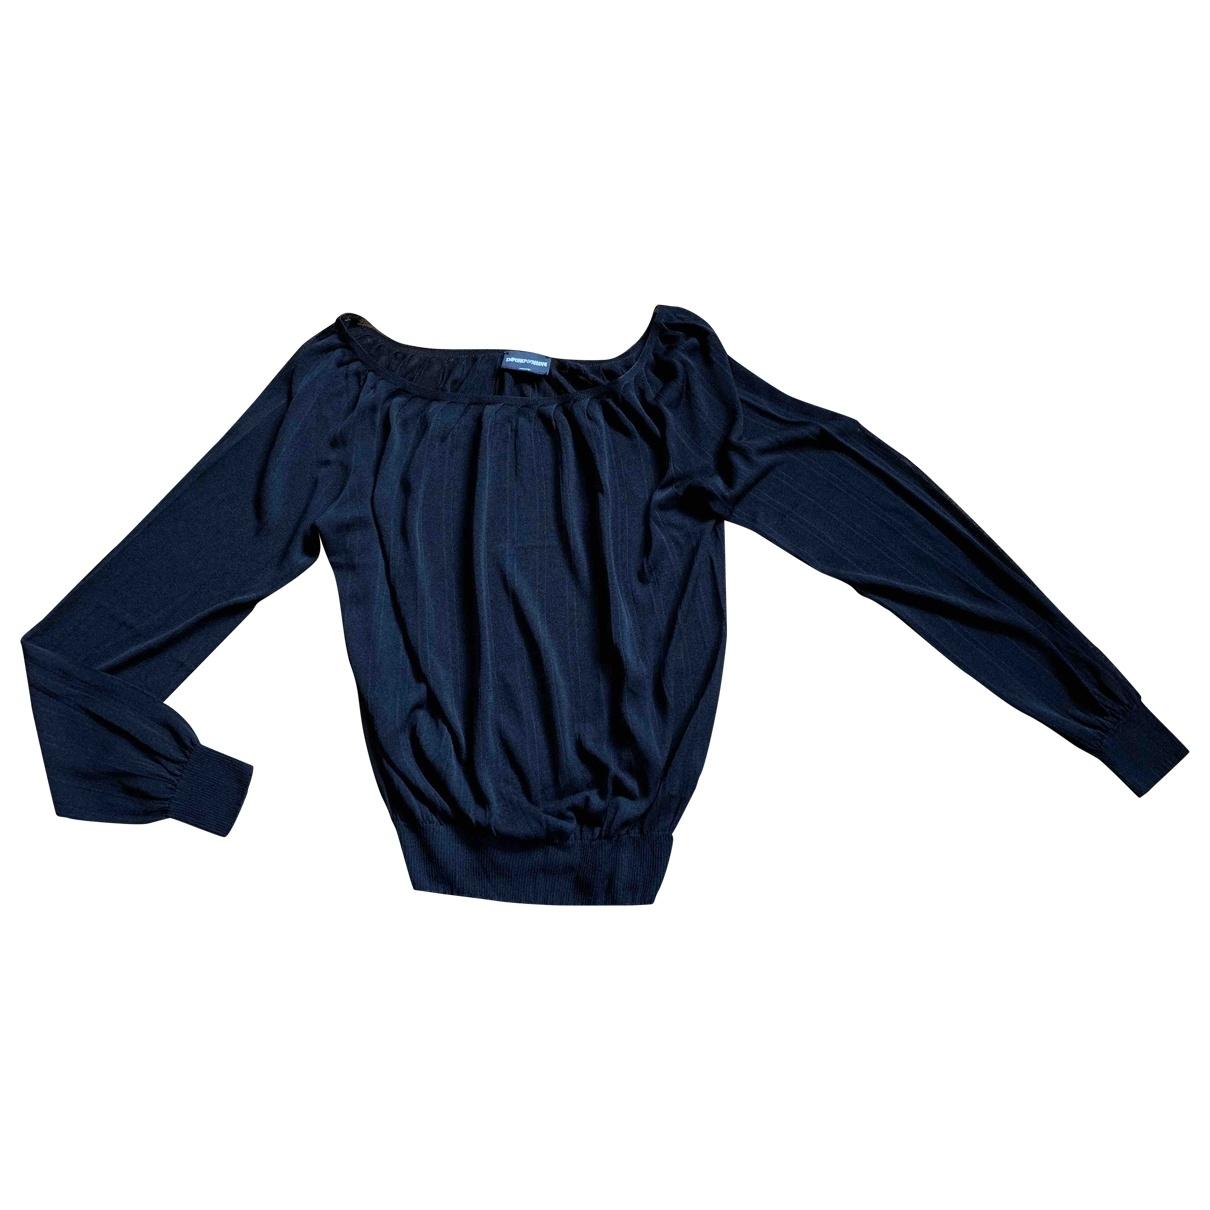 Emporio Armani \N Black Knitwear for Women L